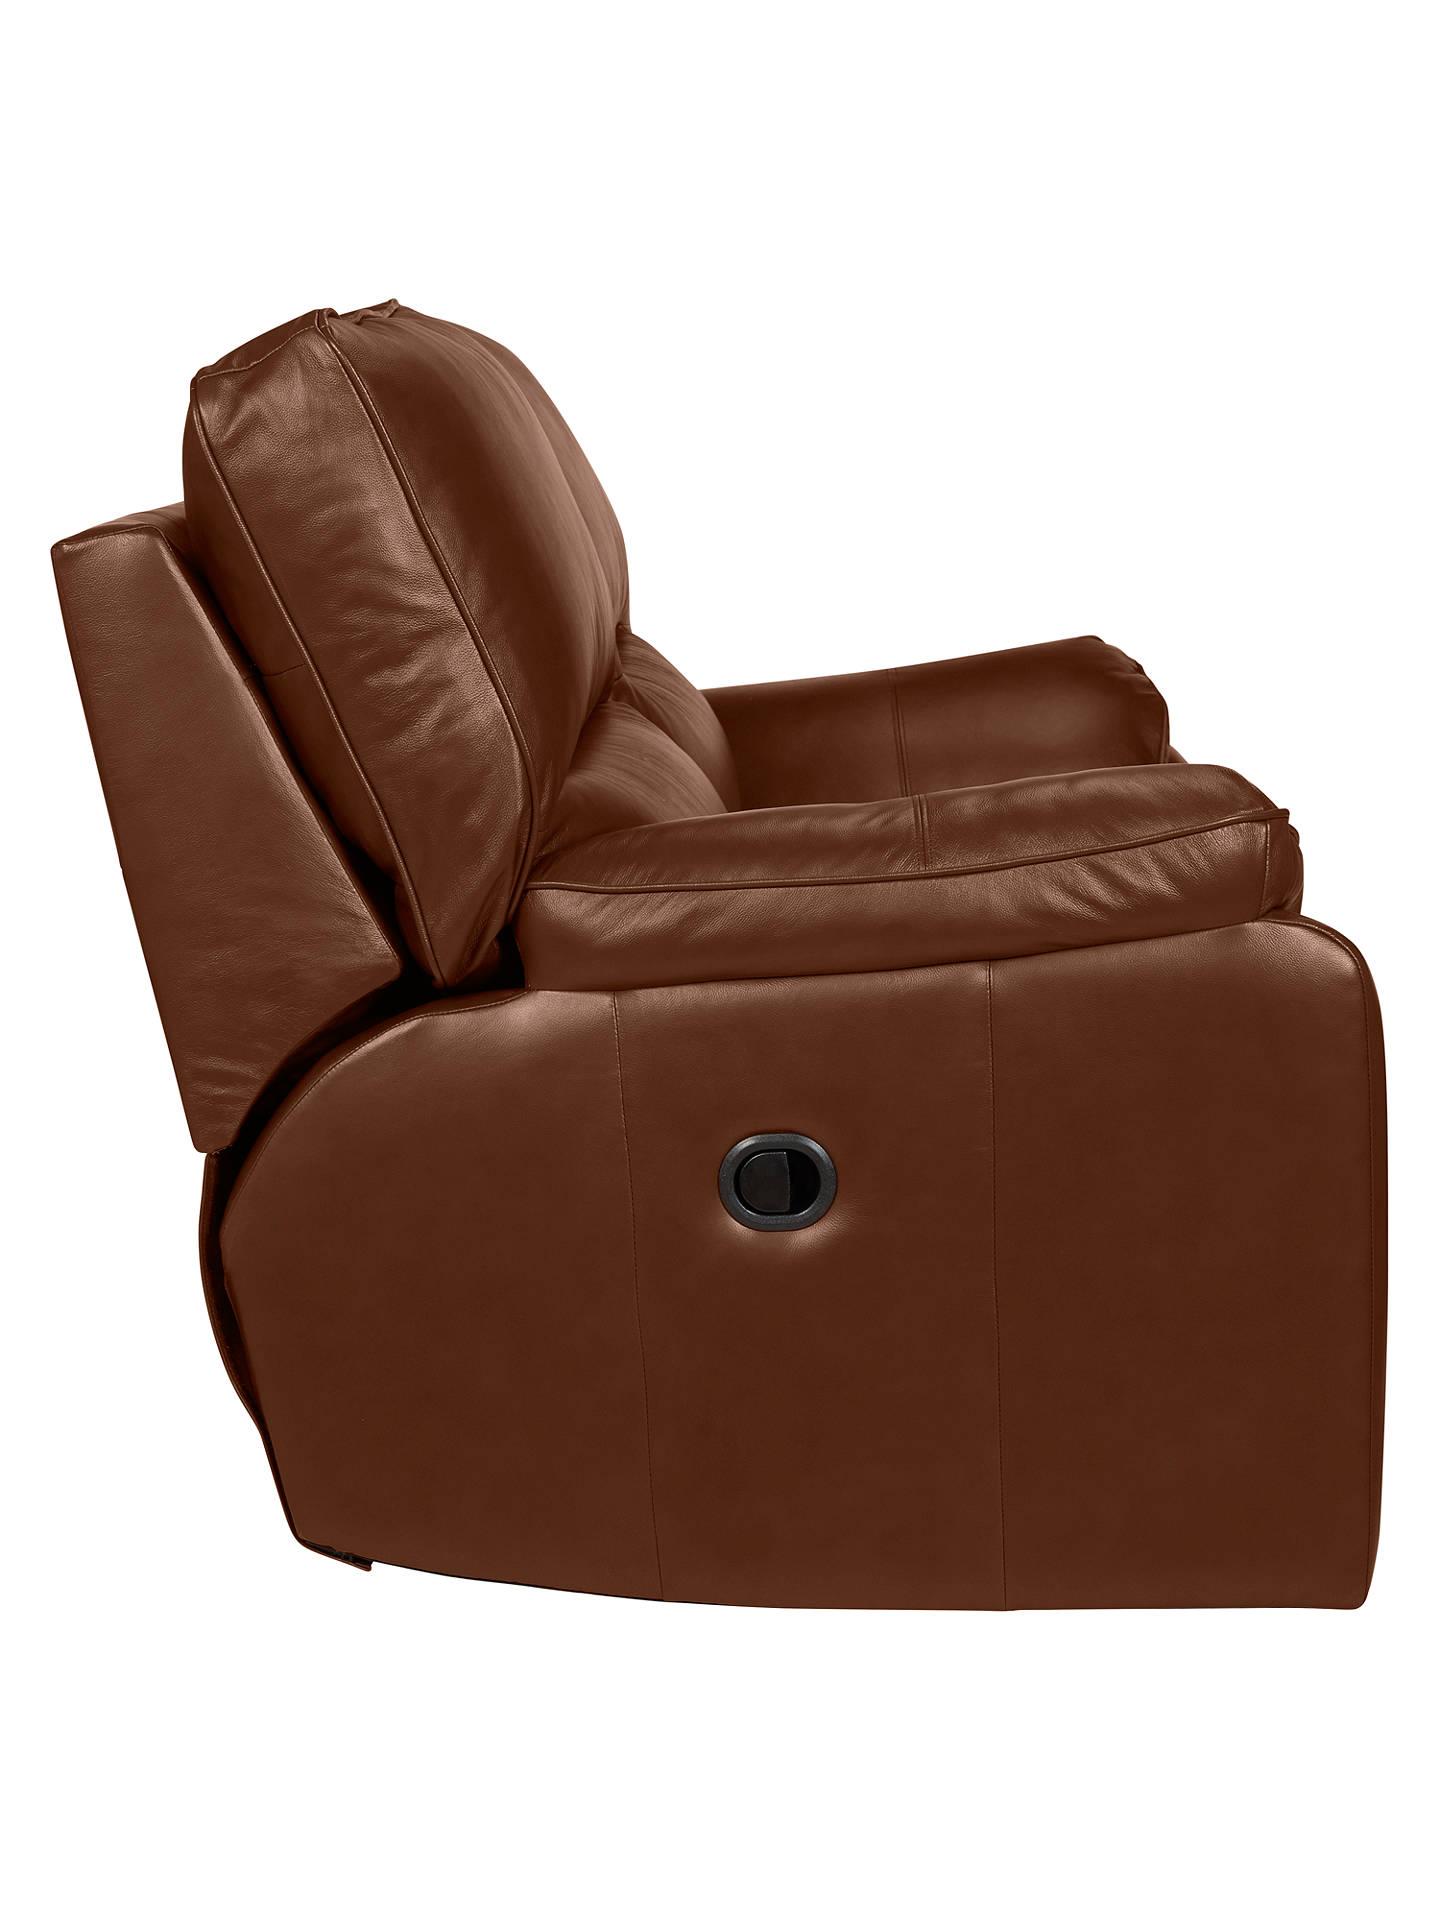 Sensational John Lewis Partners Carlisle Manual Recliner Small 2 Seater Leather Sofa Contempo Castanga Bralicious Painted Fabric Chair Ideas Braliciousco